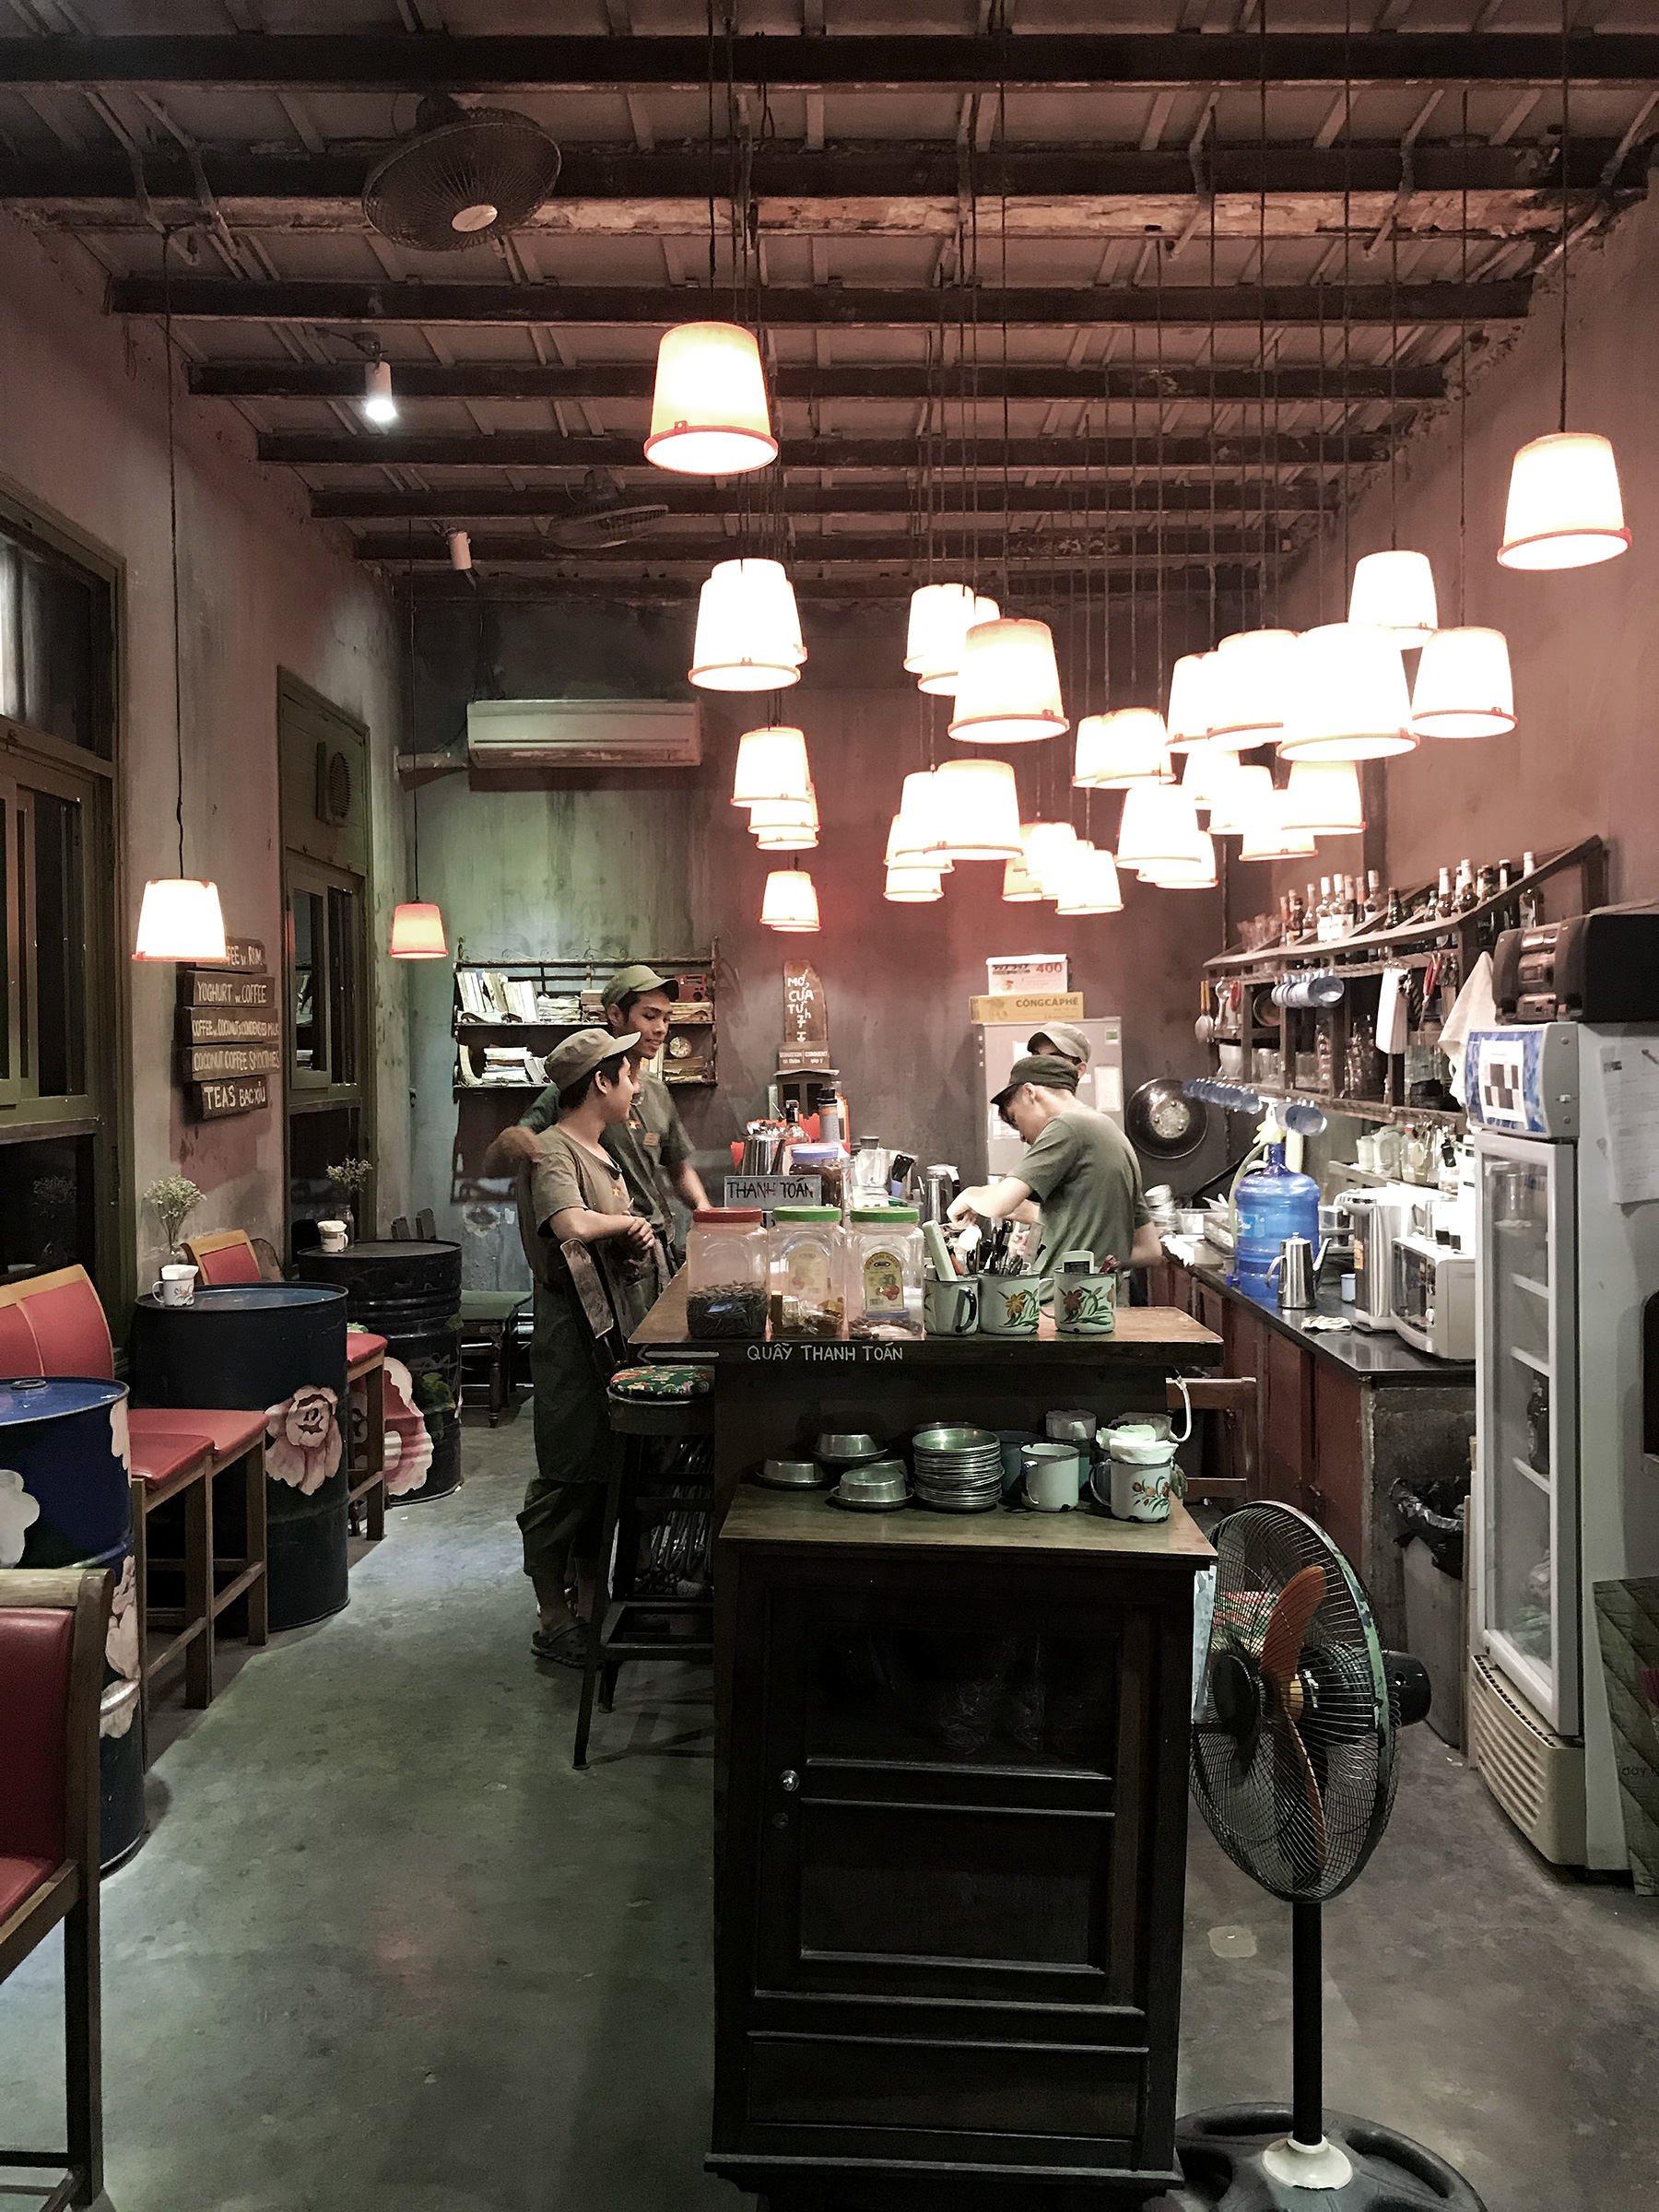 CONG CAPHE - MILITARY INSPIRED CAFE HARKING BACK TO WAR-ERA VIETNAM